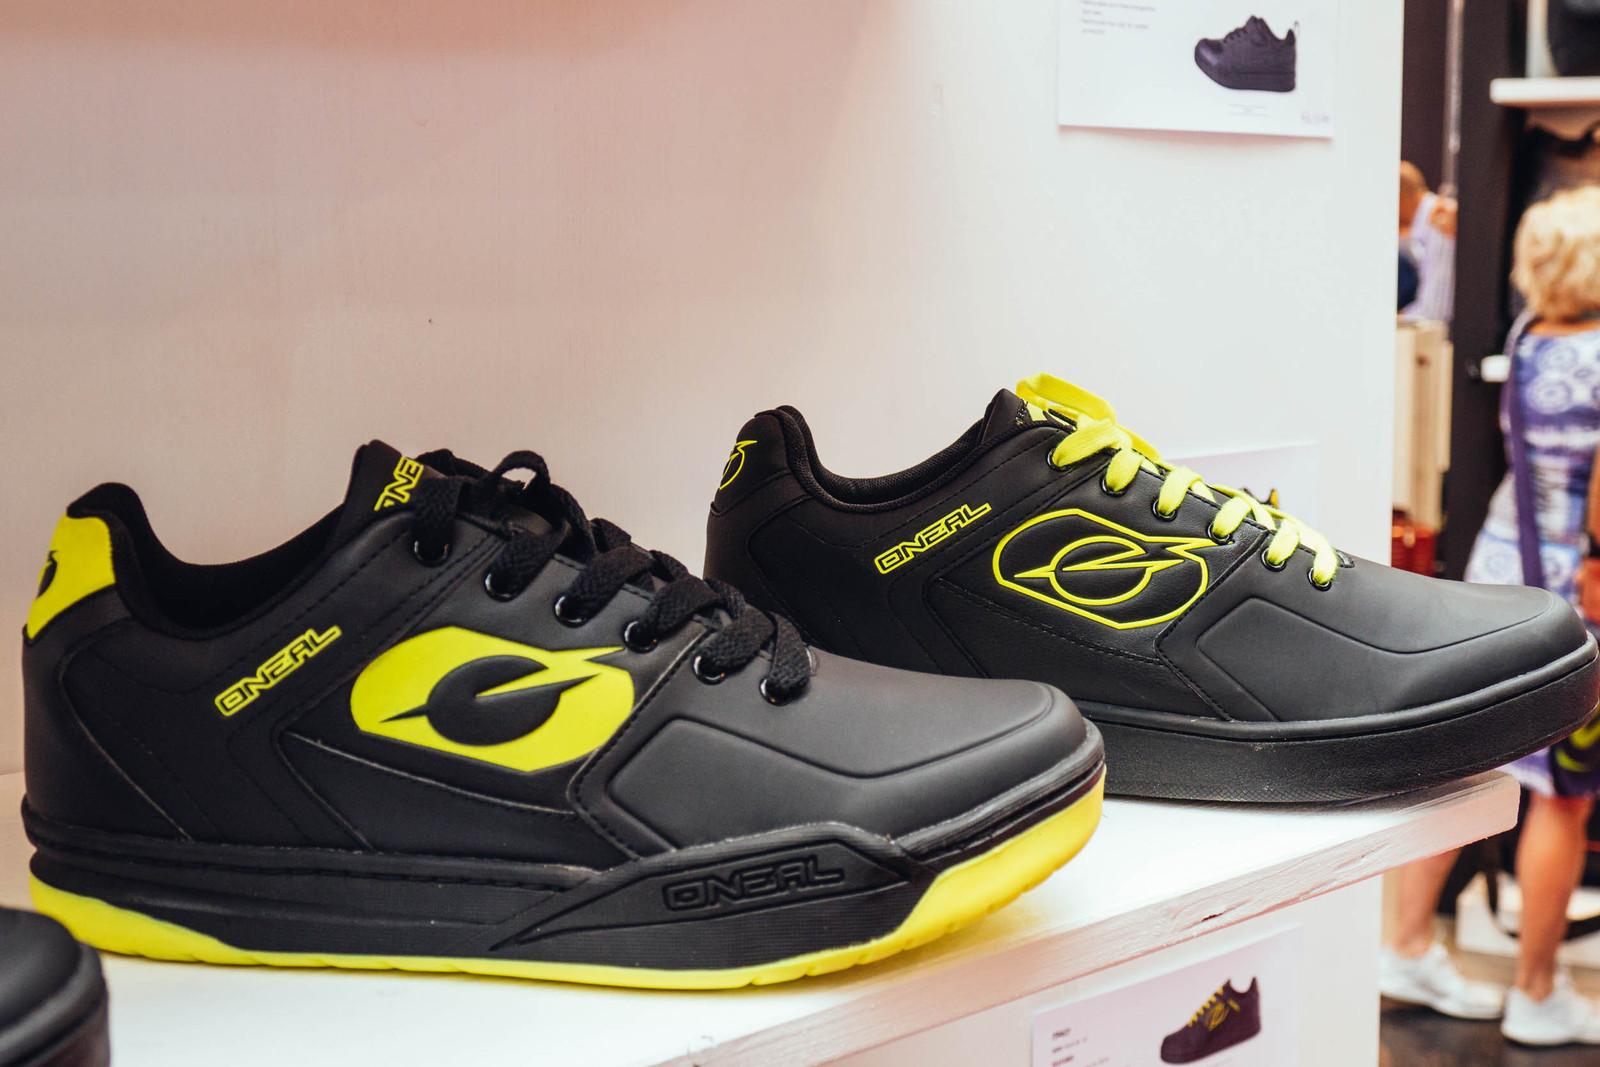 O'Neal MTB-Schuhe Pinned SPD oXfRr0